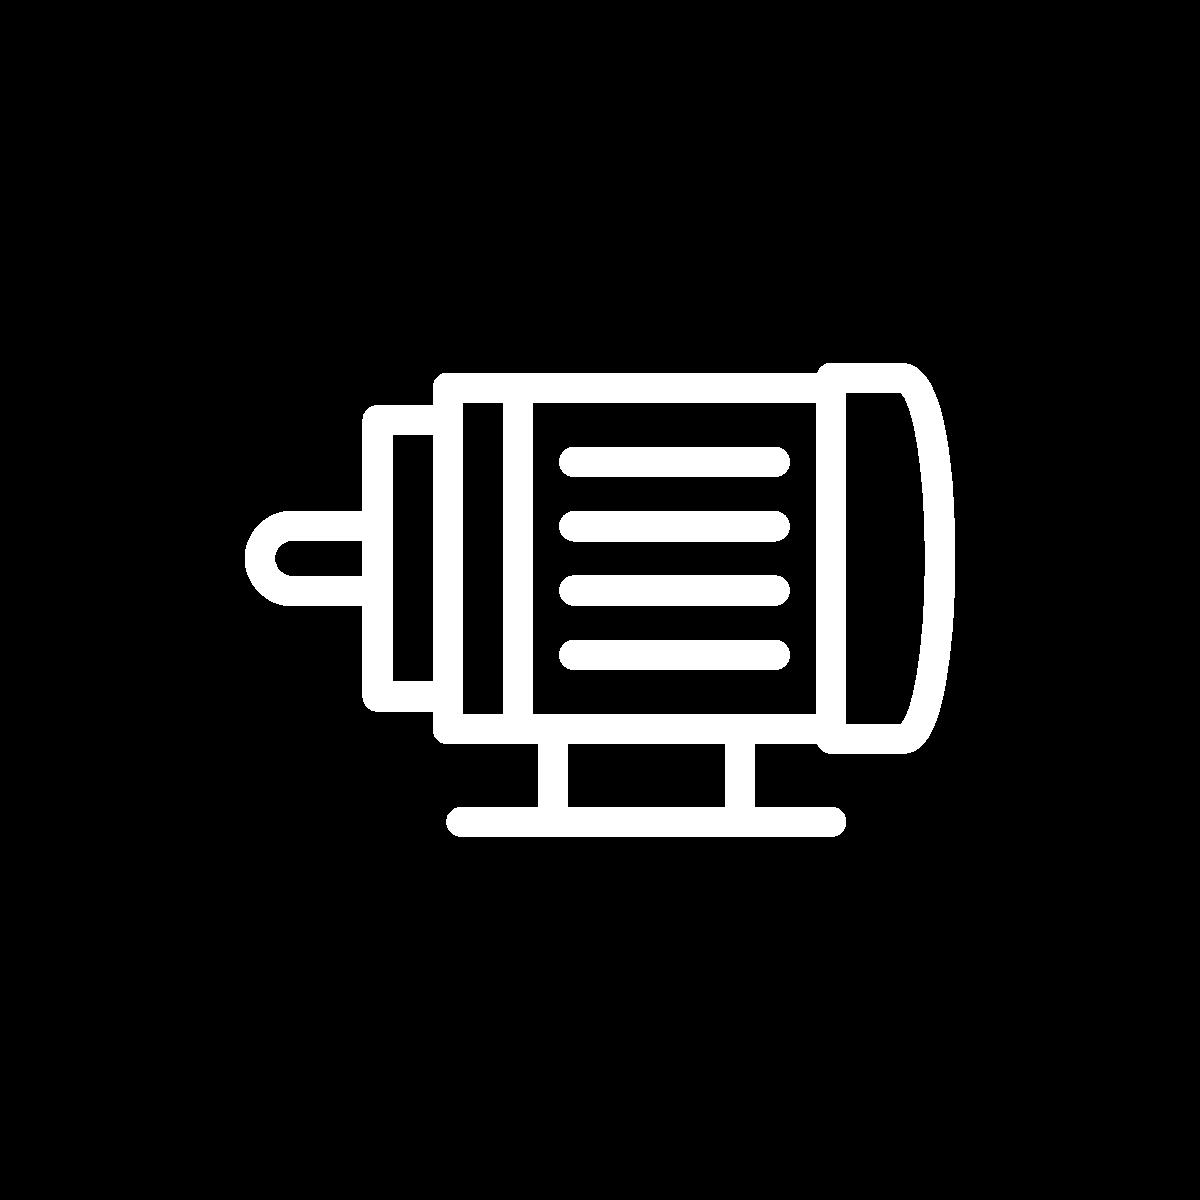 motor oem icon